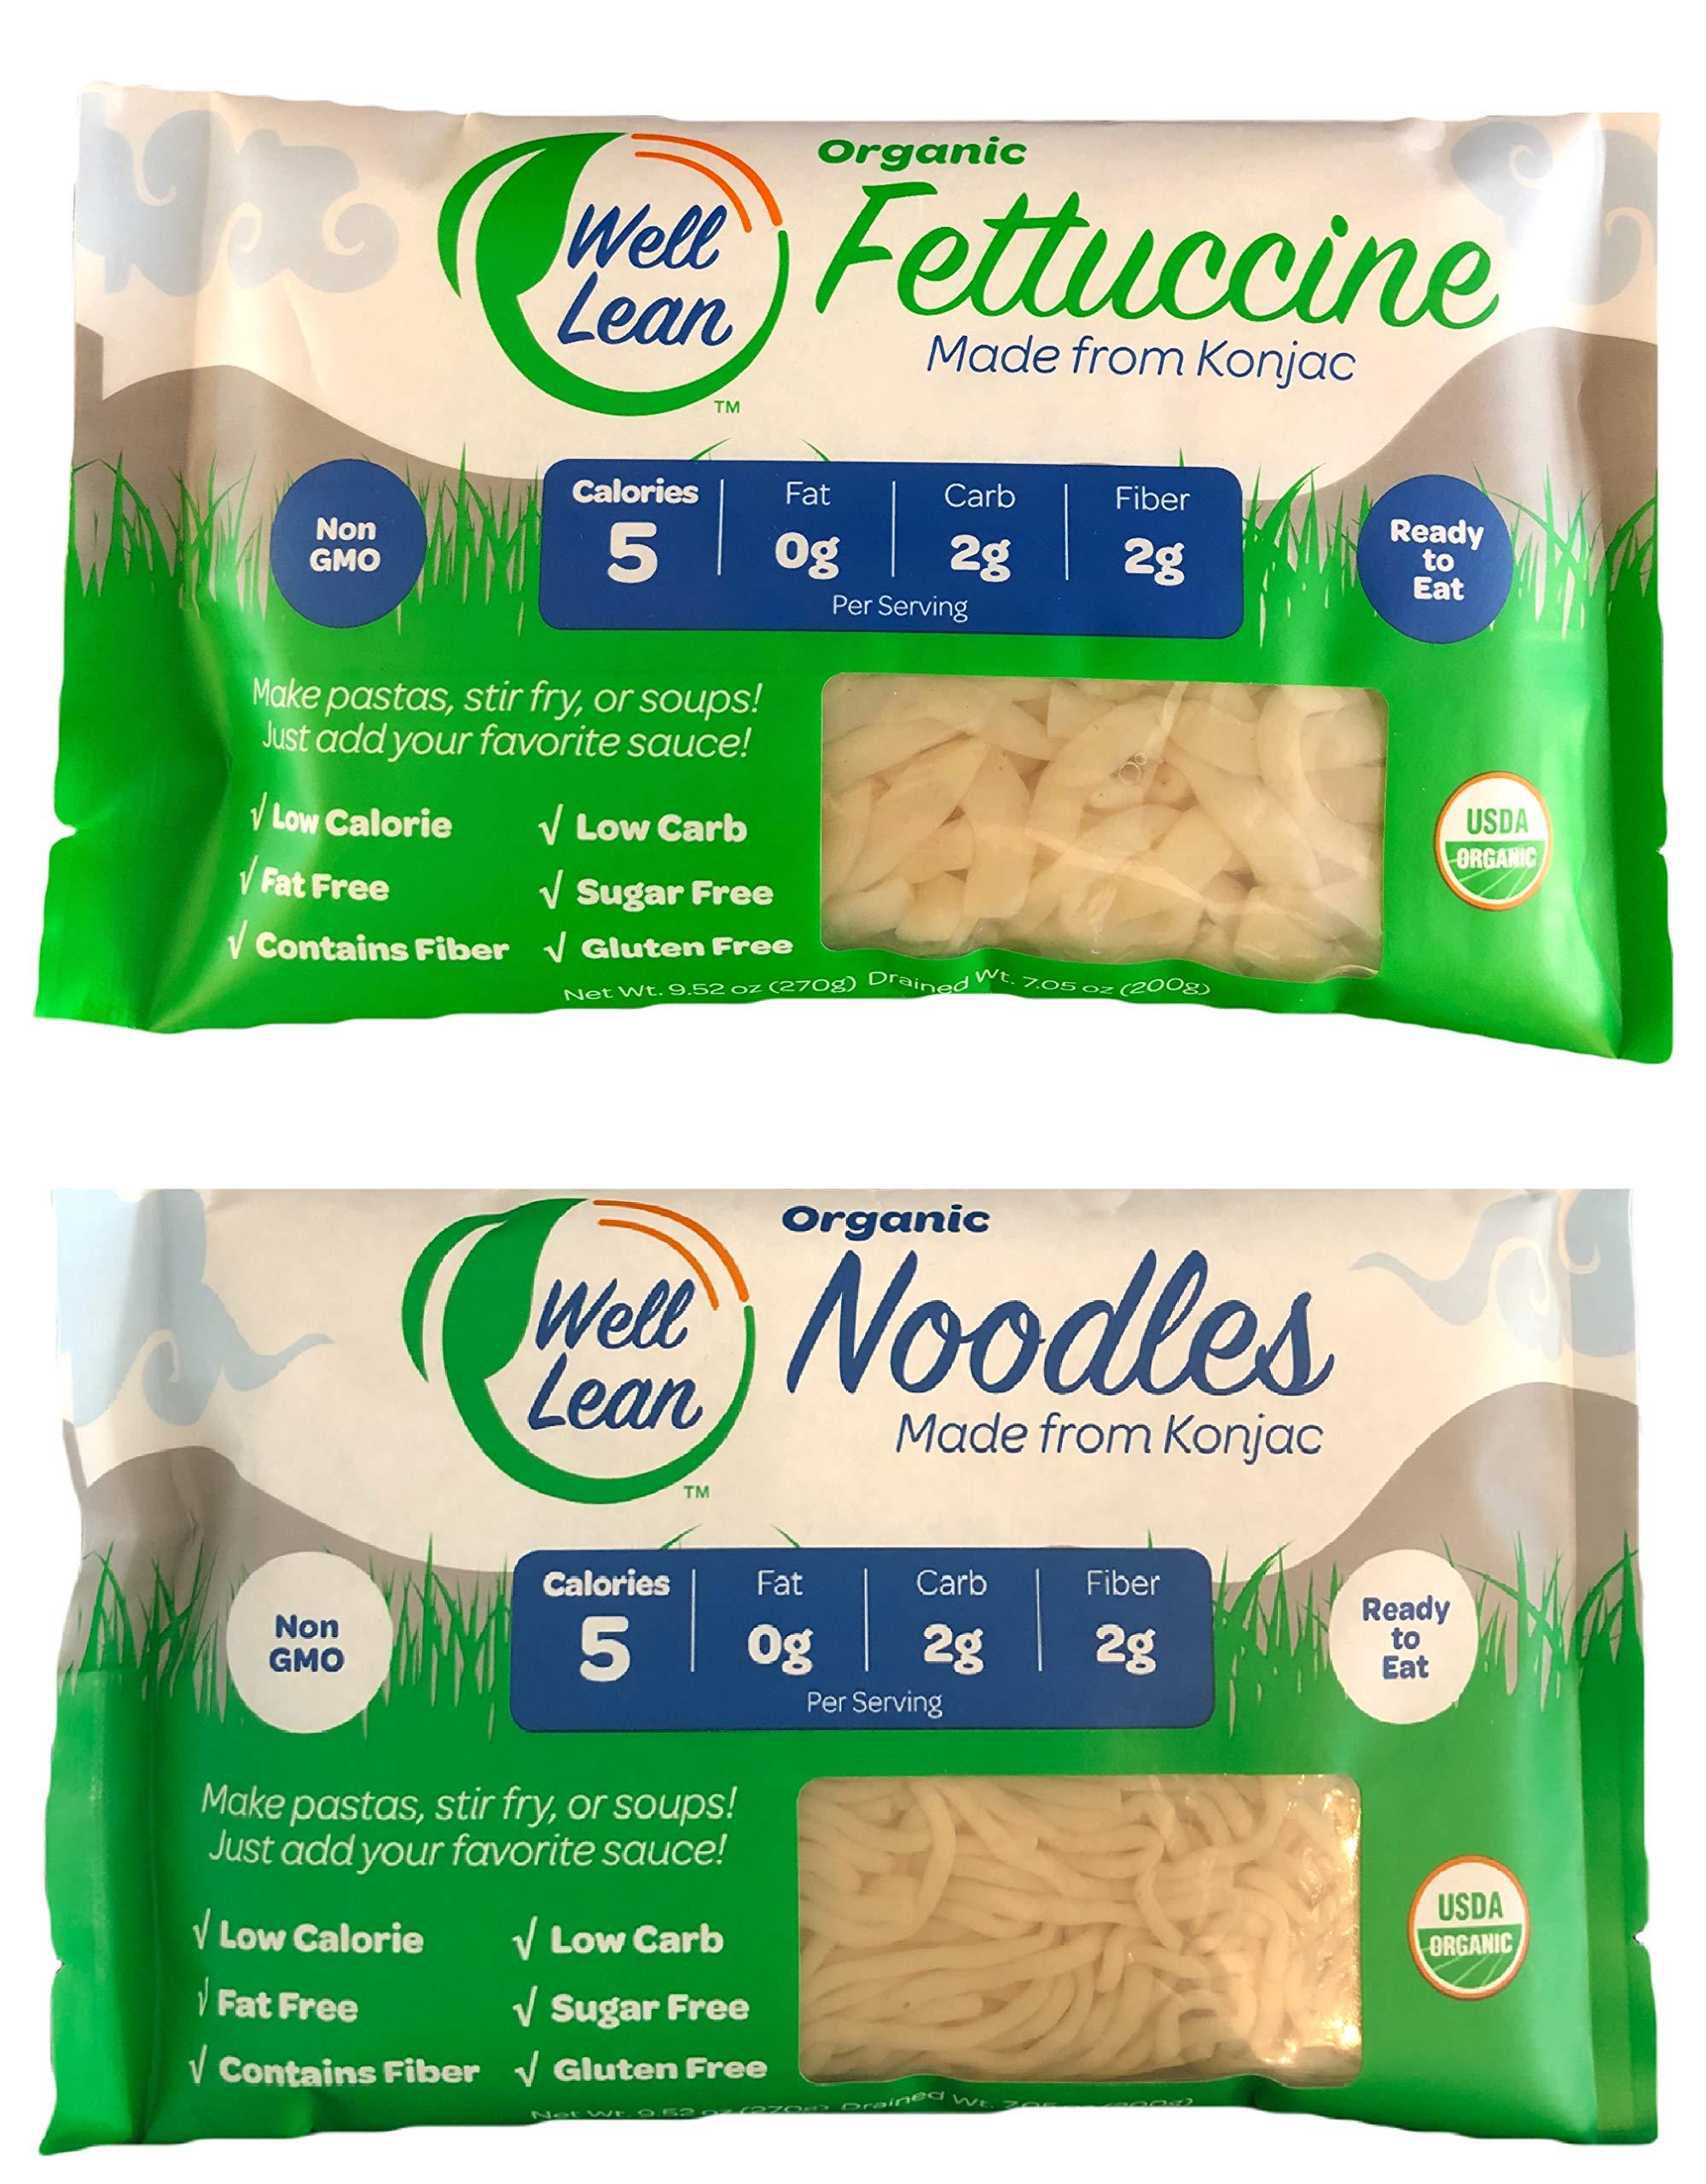 Organic Well Lean Variety (20 Pack/190.3 oz) - Premium Shirataki [ODOR FREE, Non-GMO, Ready to Eat, No Boiling] - (Includes: 10 Shirataki Noodles and 10 Shirataki Fettuccine) - Premium Konjac Pasta by Well lean